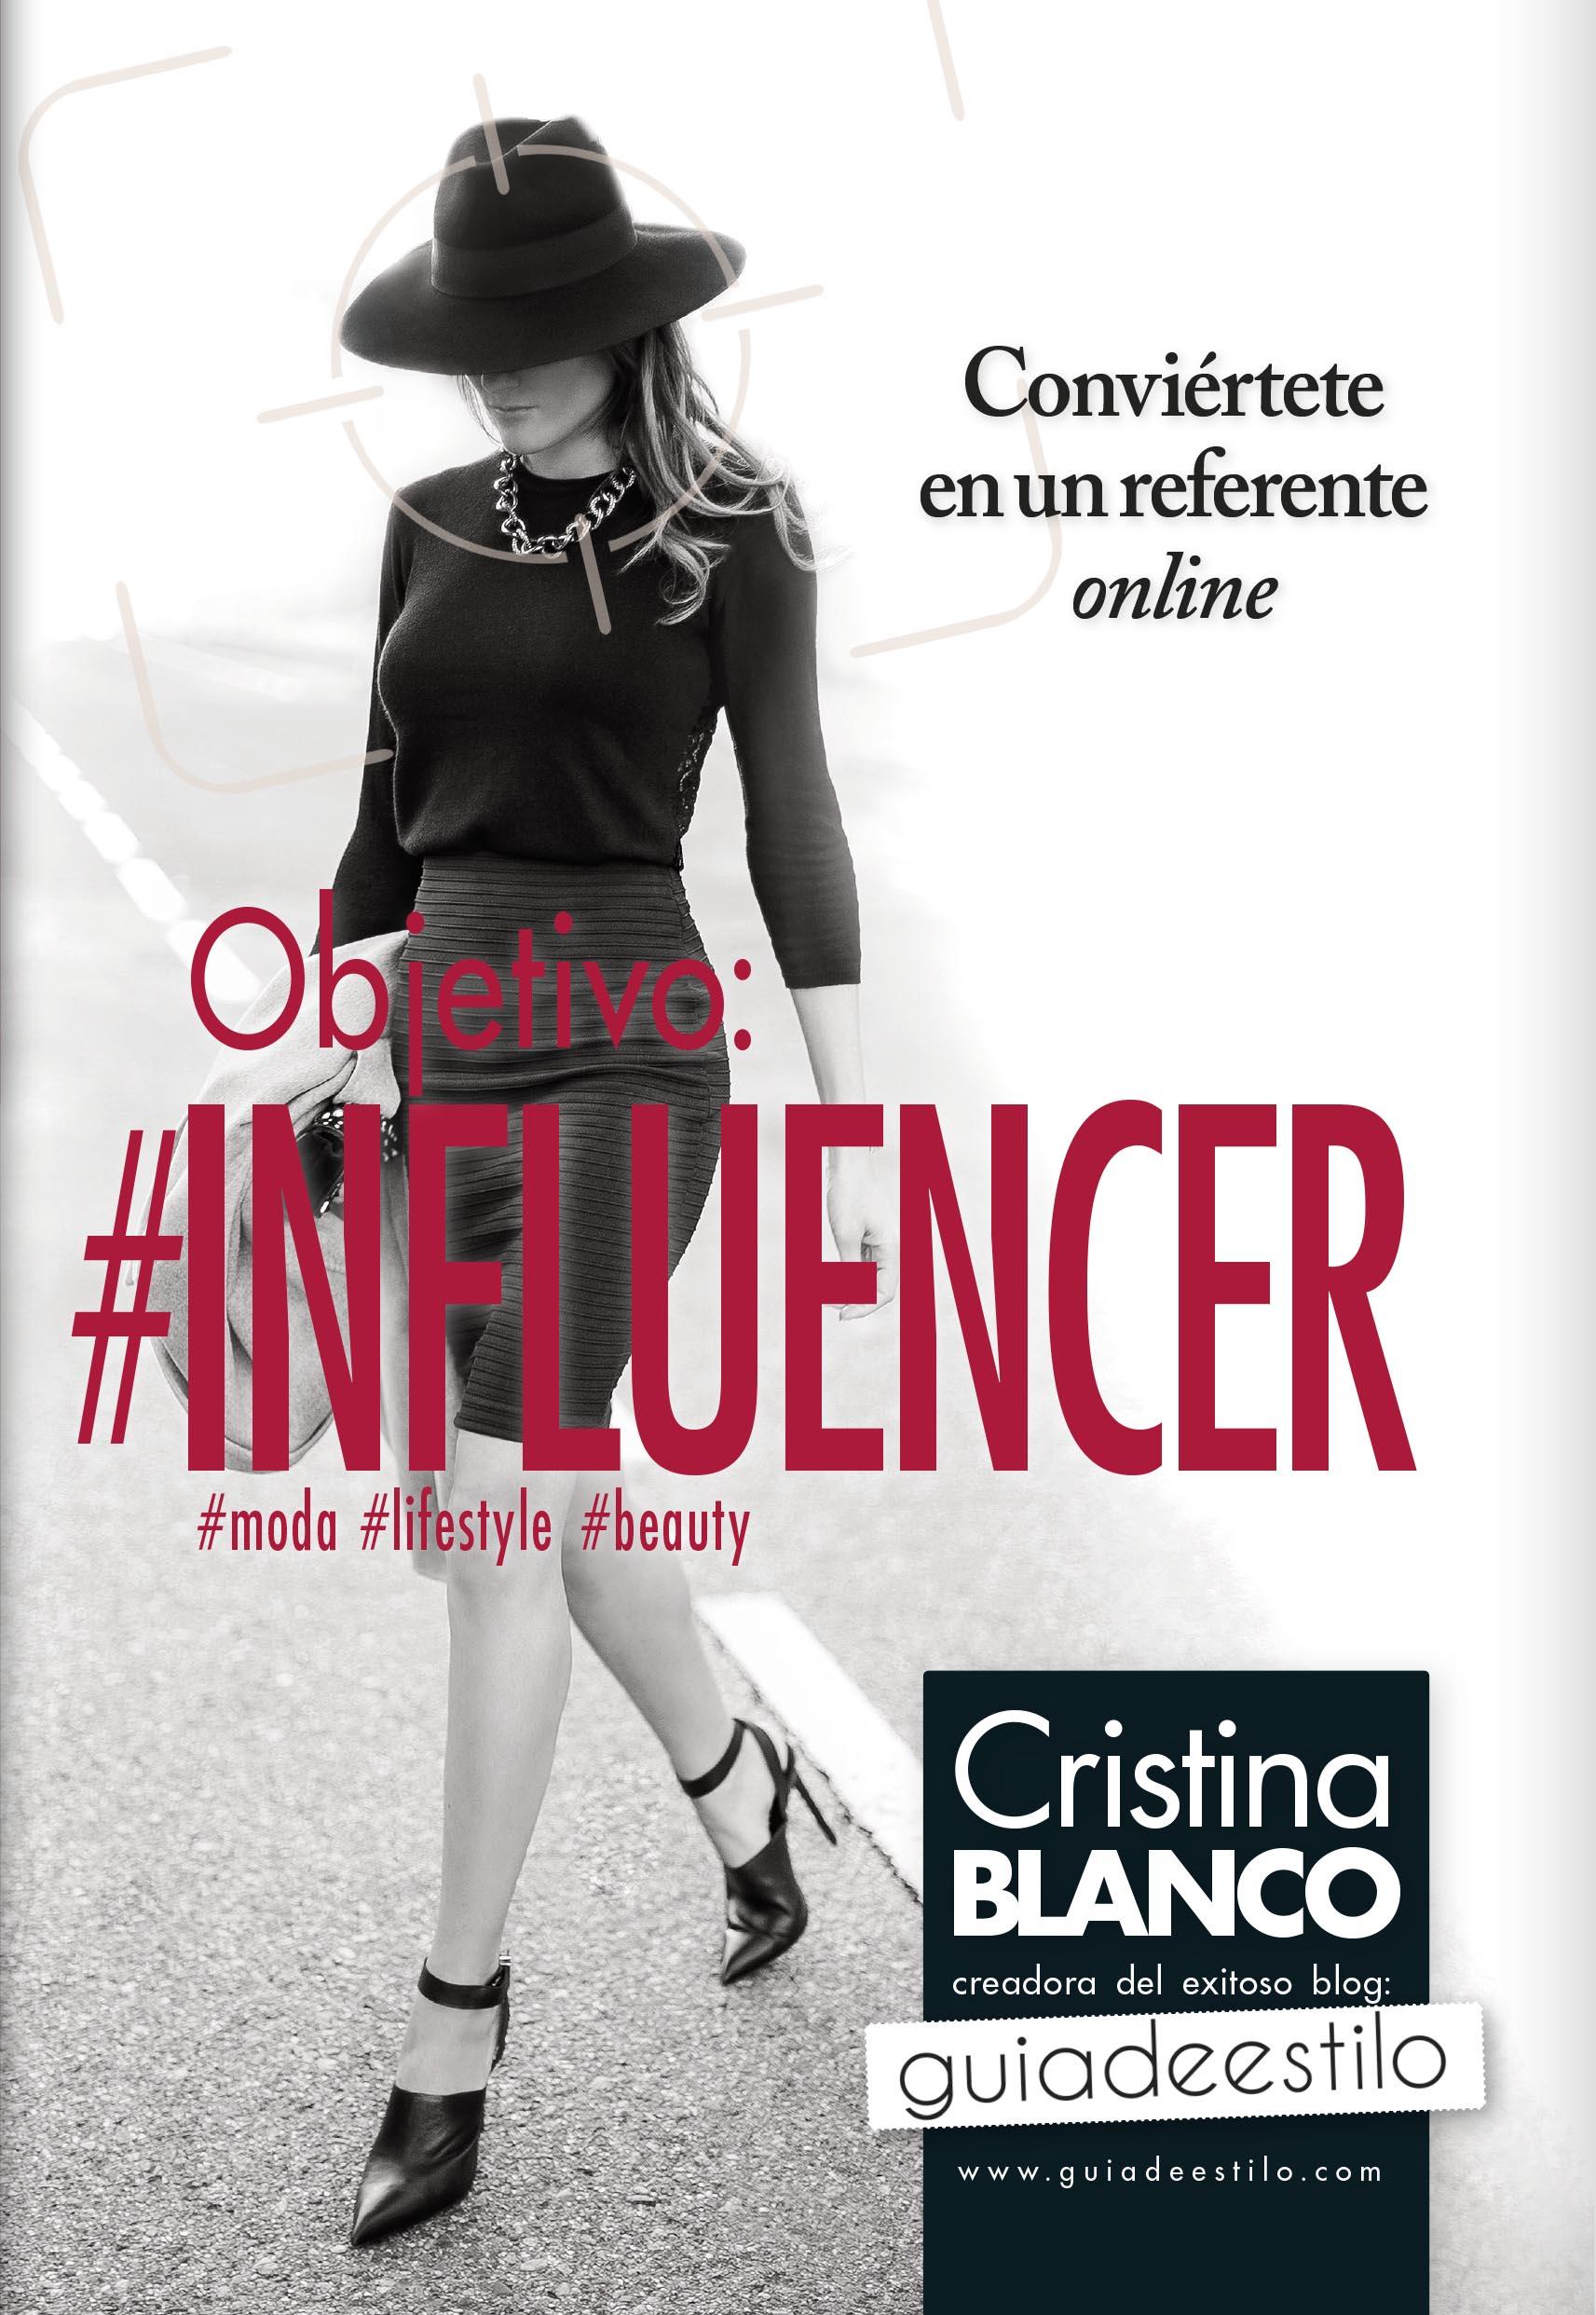 Objetivo: Influencer